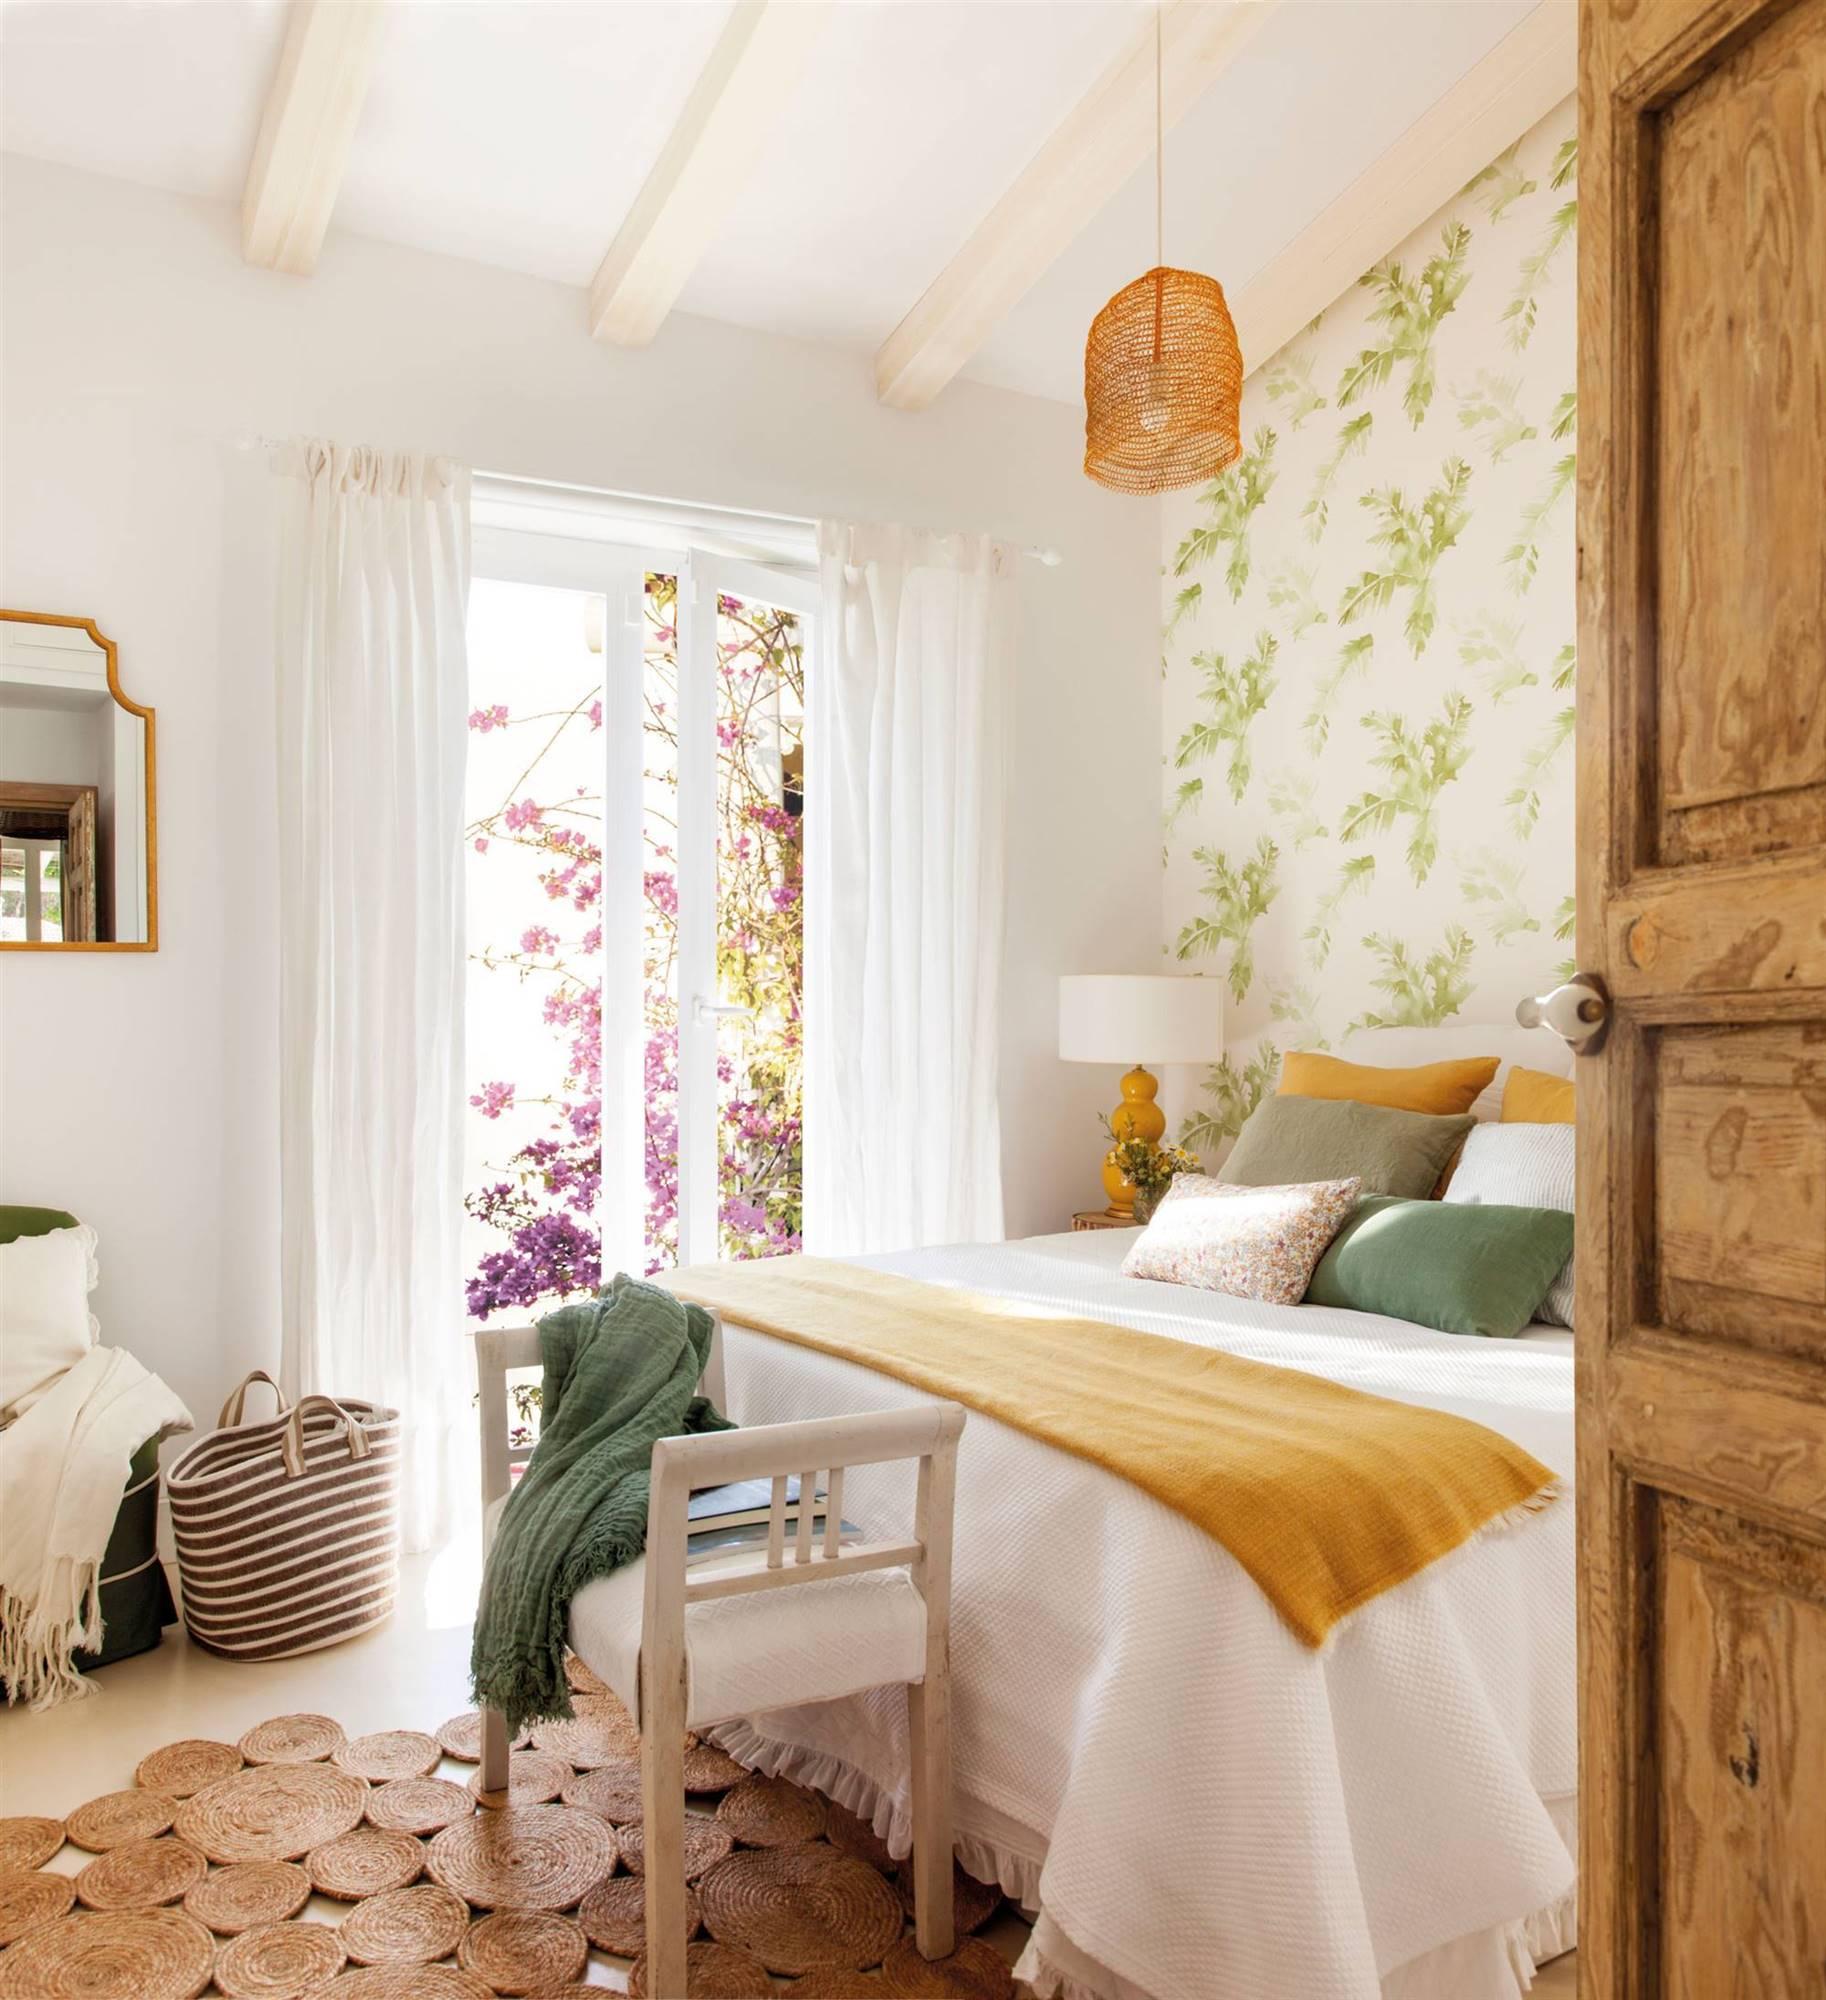 593 fotos de papel pintado - Dormitorios con papel pintado ...